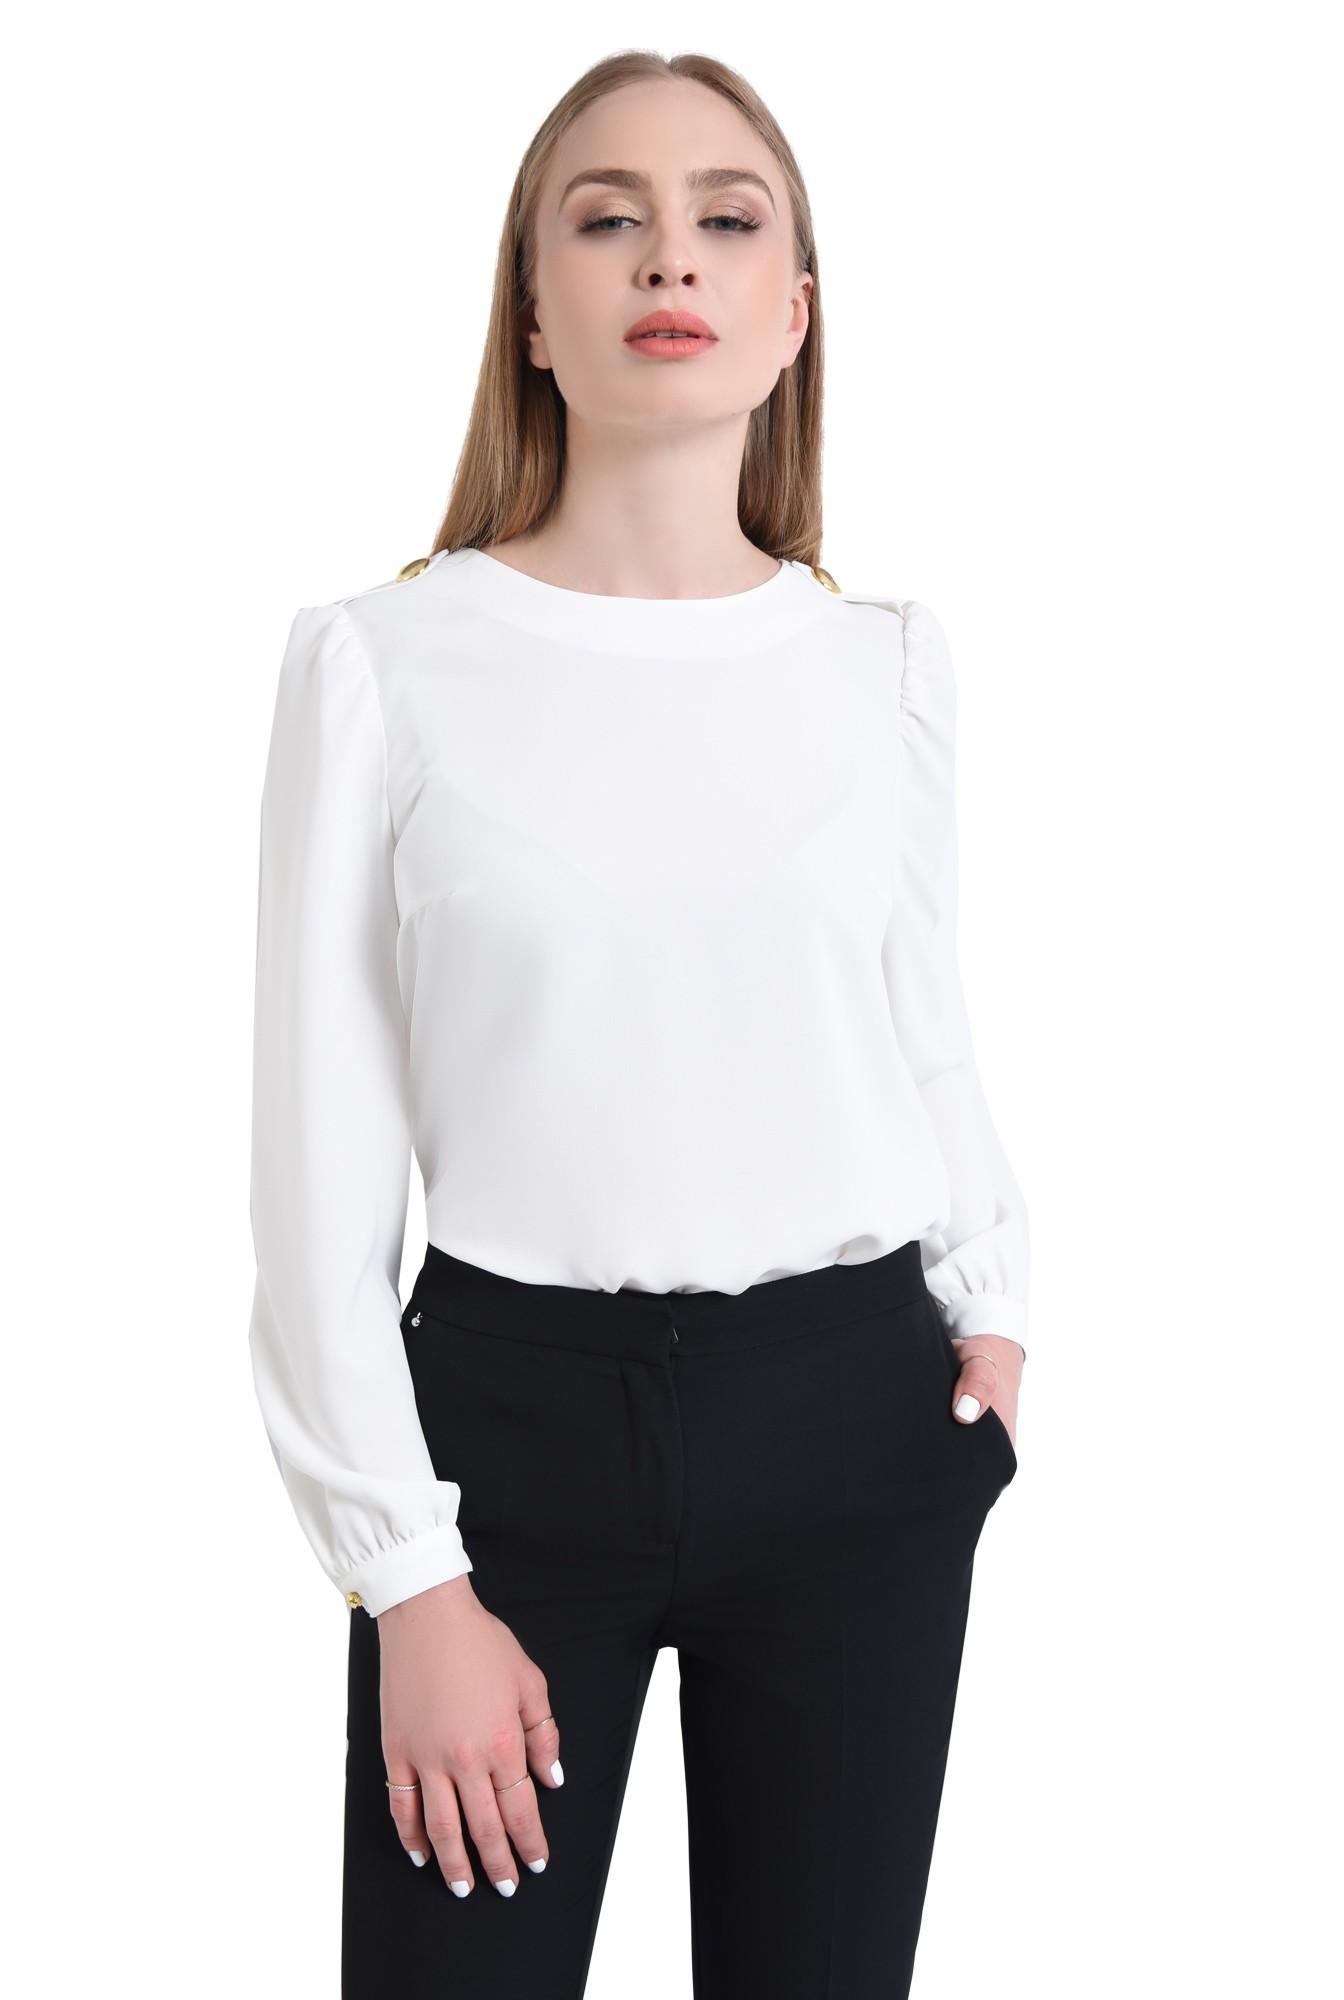 0 - bluza casual, dreapta, crep, epoleti, nasturi decorativi